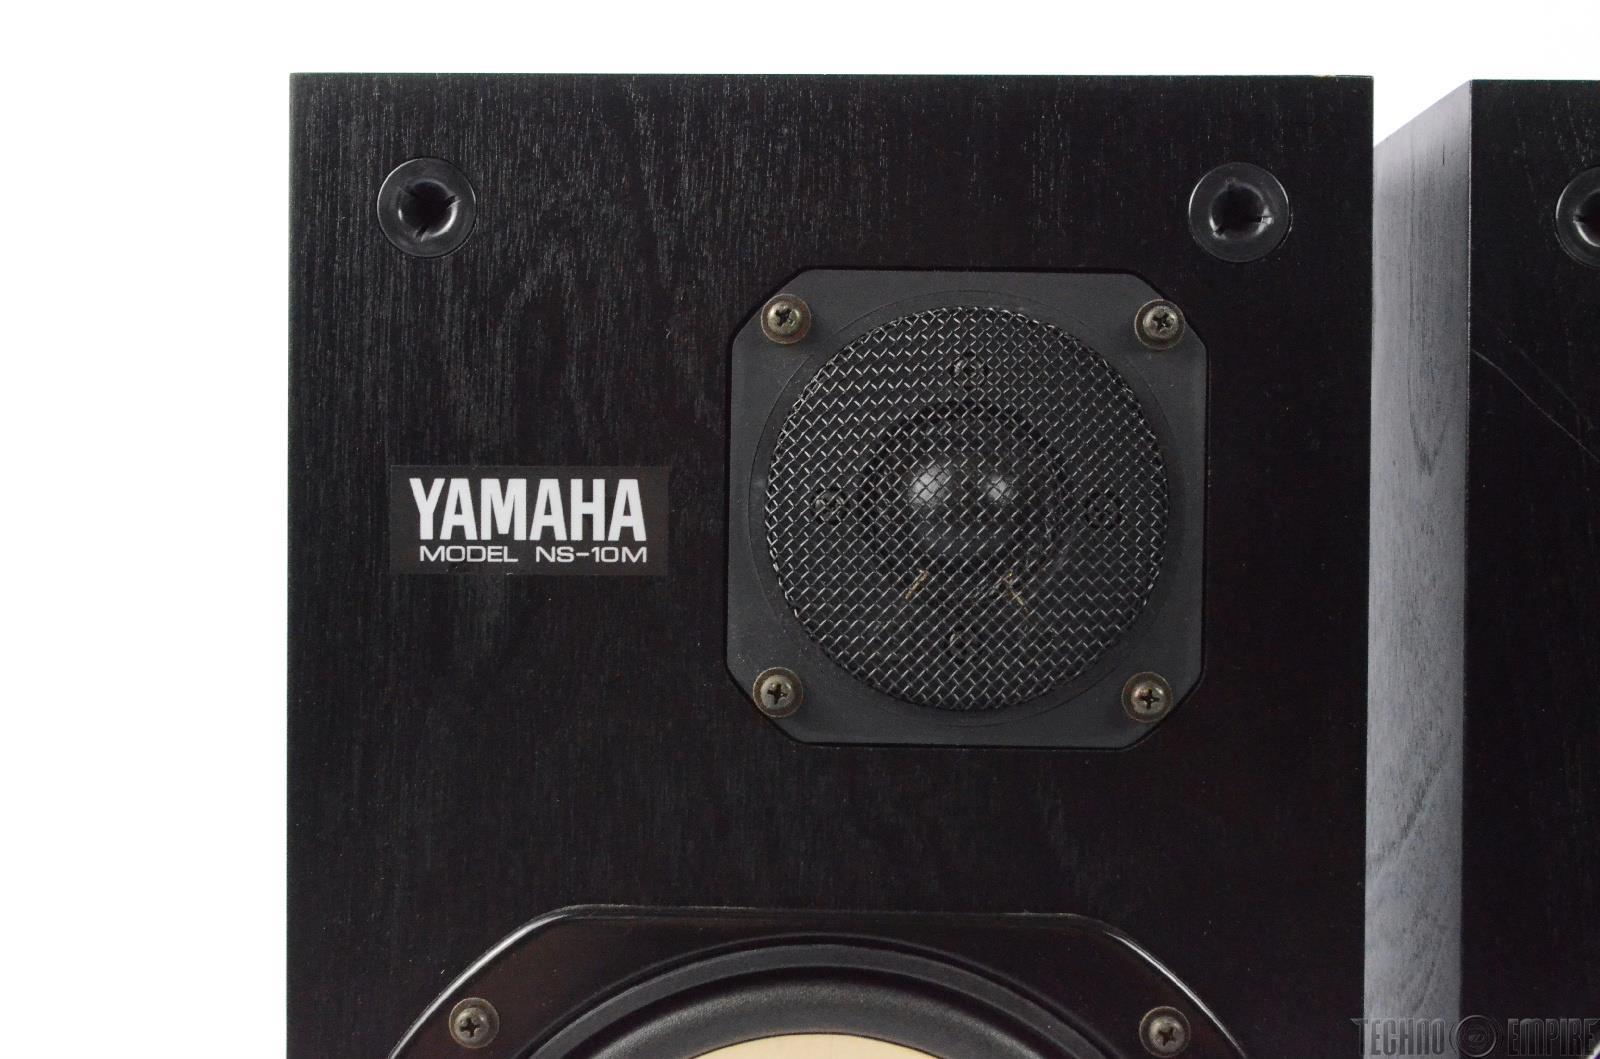 yamaha ns10m. yamaha ns-10m speaker system nearfield reference studio monitor pair #24930 ns10m 0